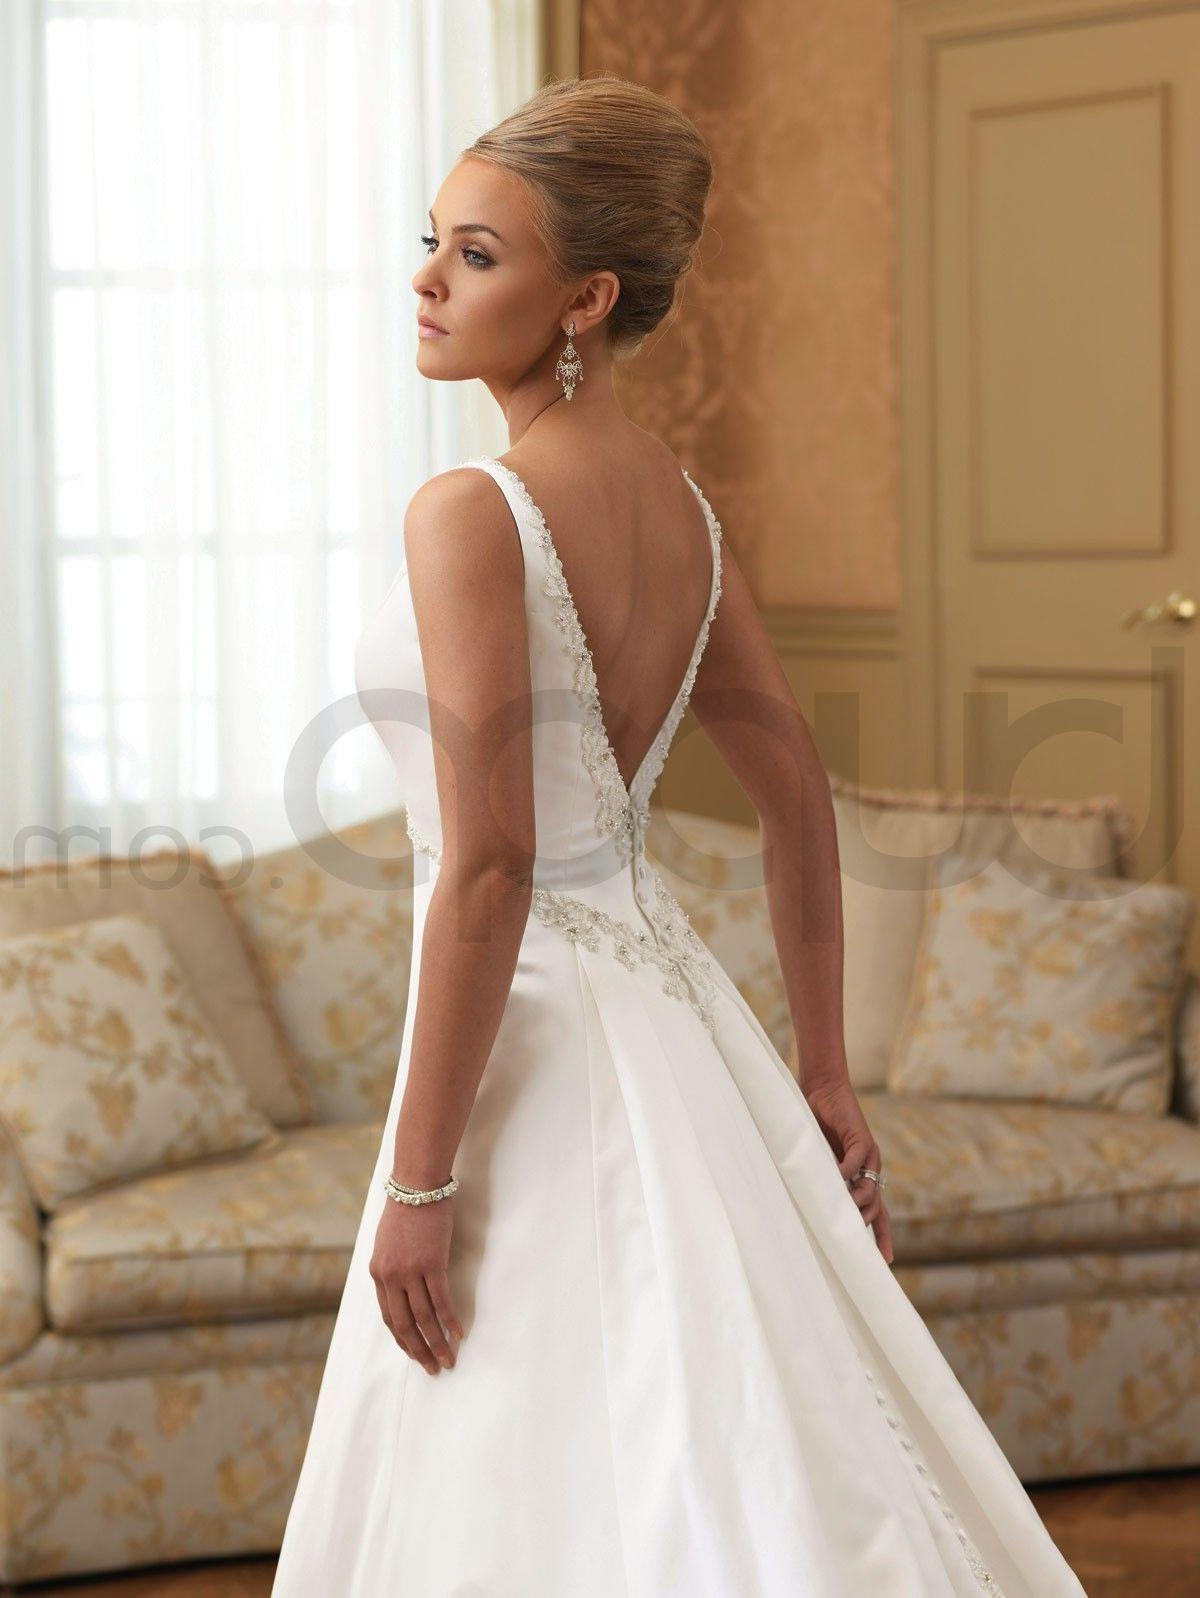 y Low Back Wedding Dress Viewing Gallery